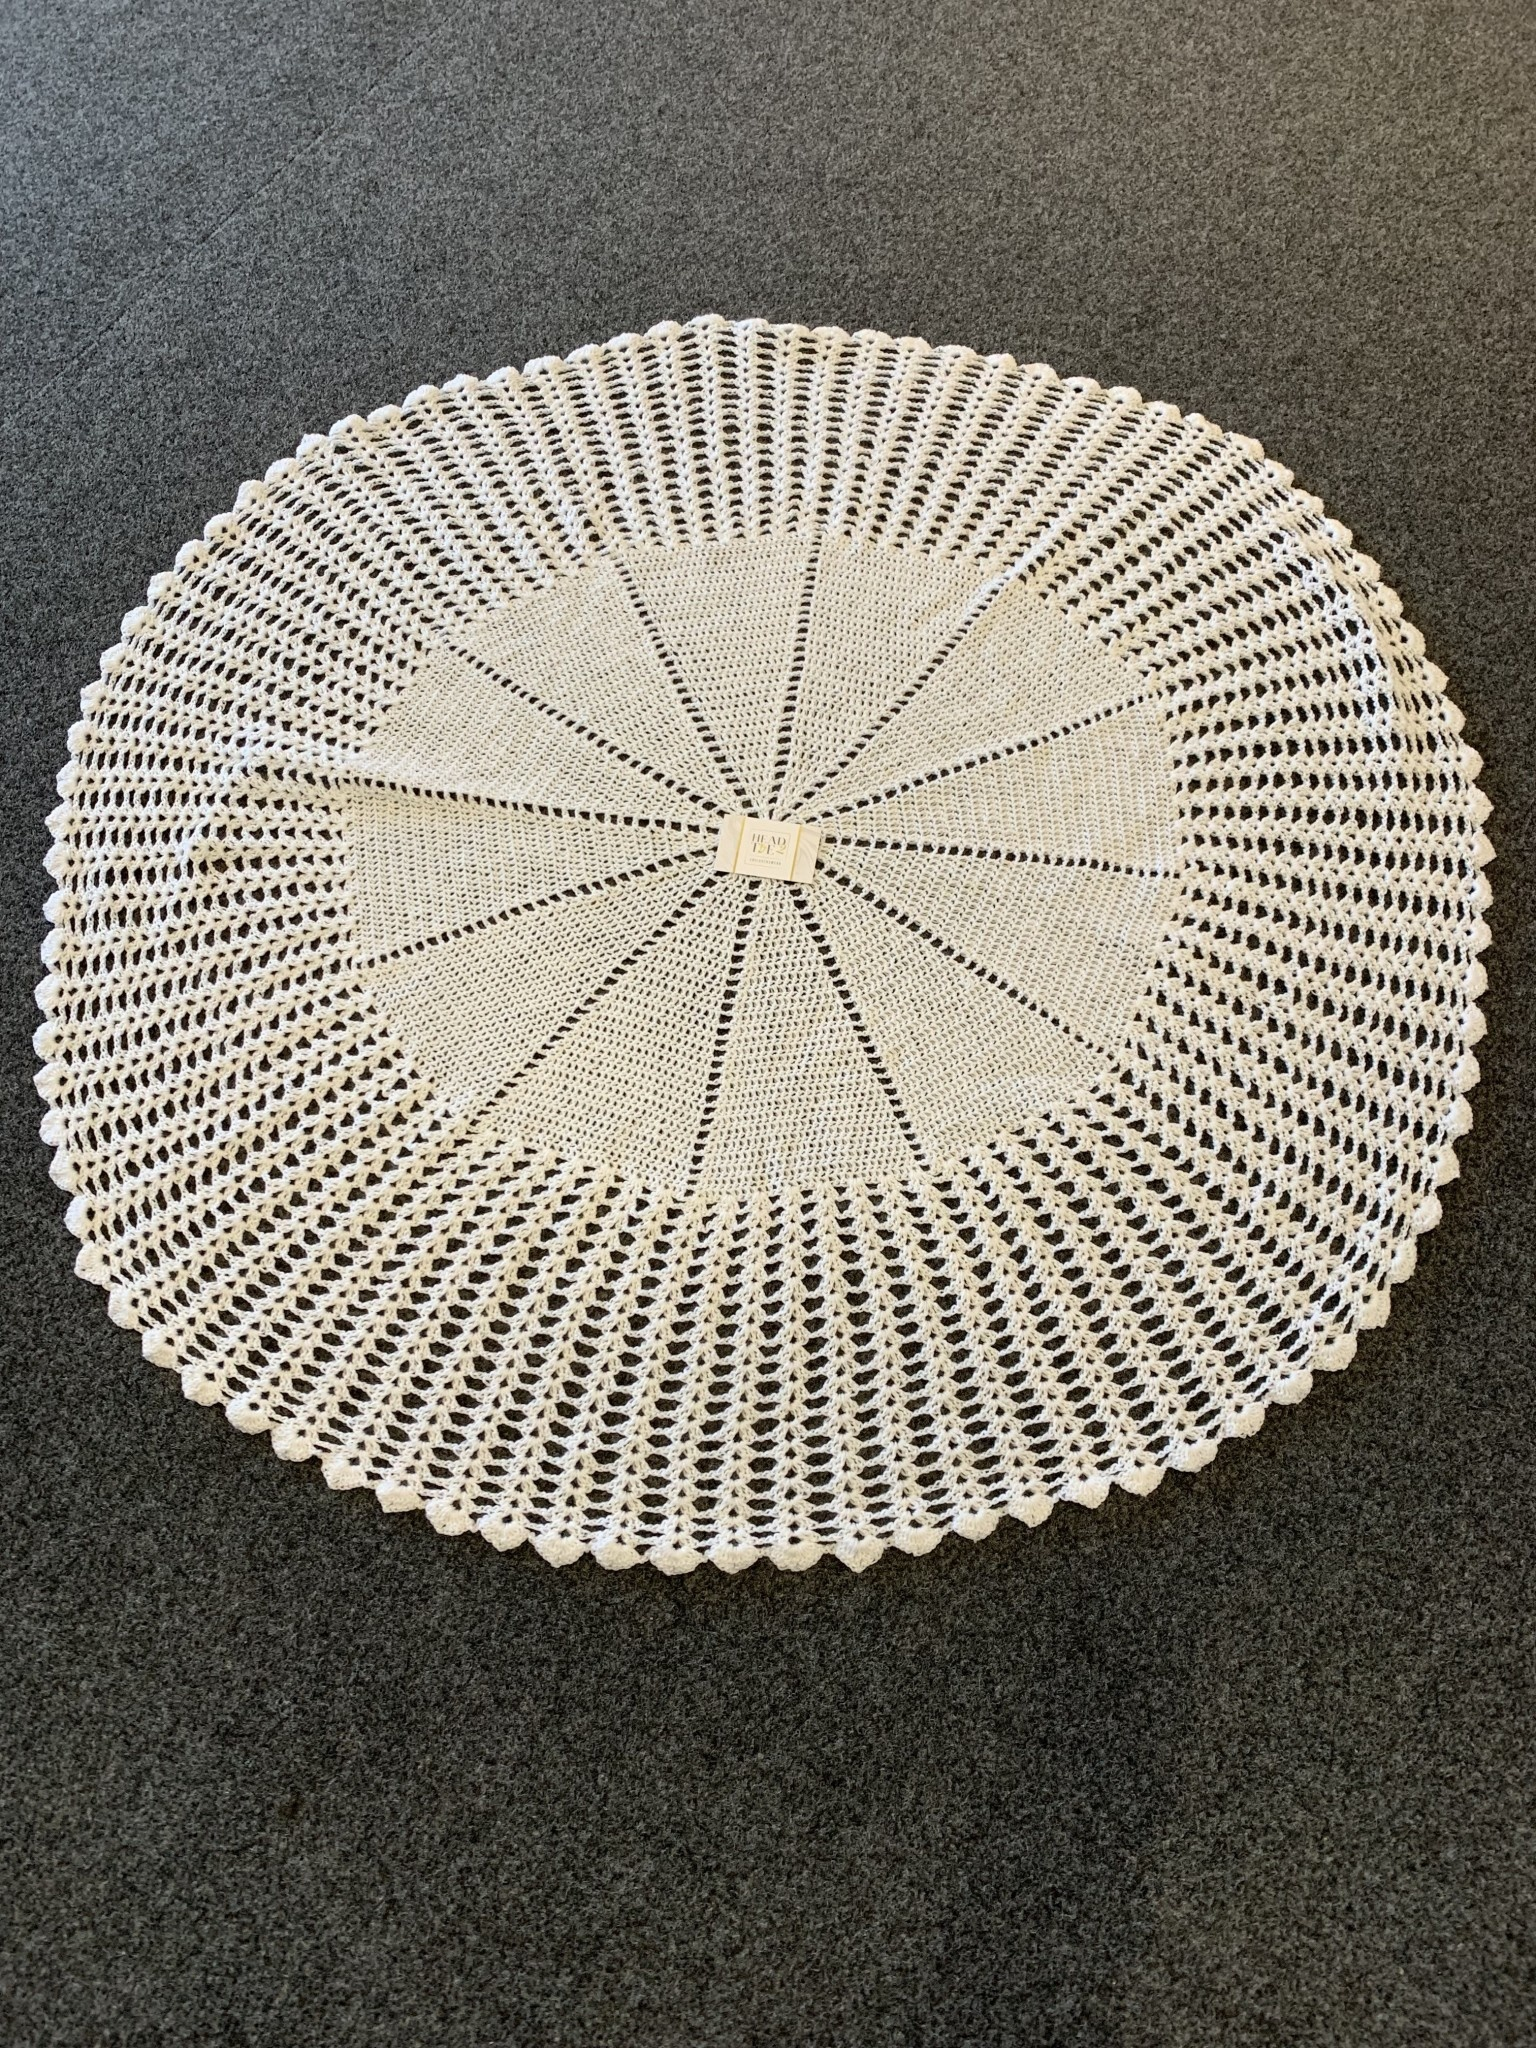 Handmade Large Knitted Shawl White